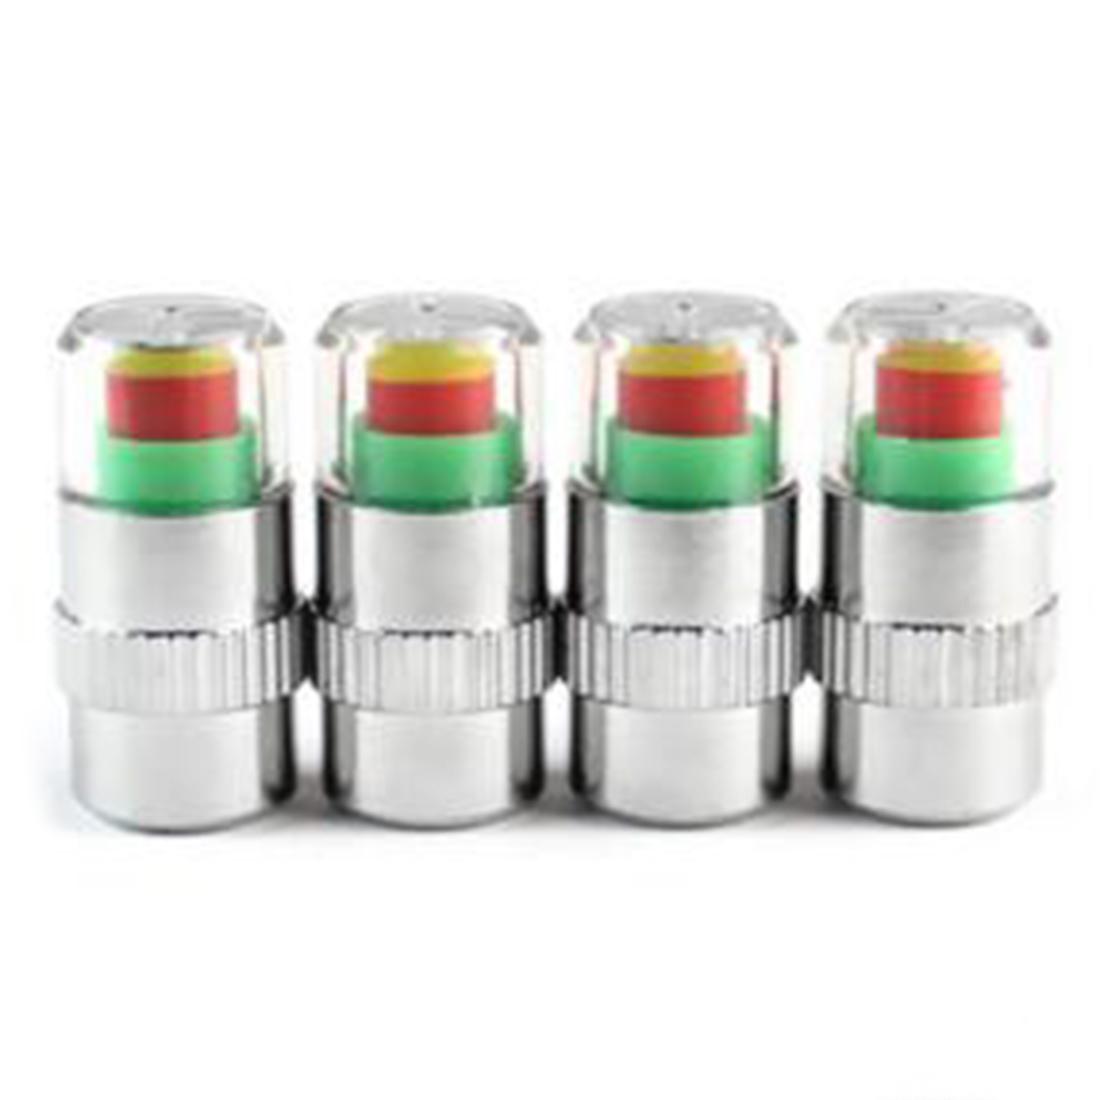 New Sale 4 pcs 2.4Bar (36PSI) Auto Air Pressure Alert Indicator Valve Stem Monitor Sensor Caps Car Free Shipping(China (Mainland))